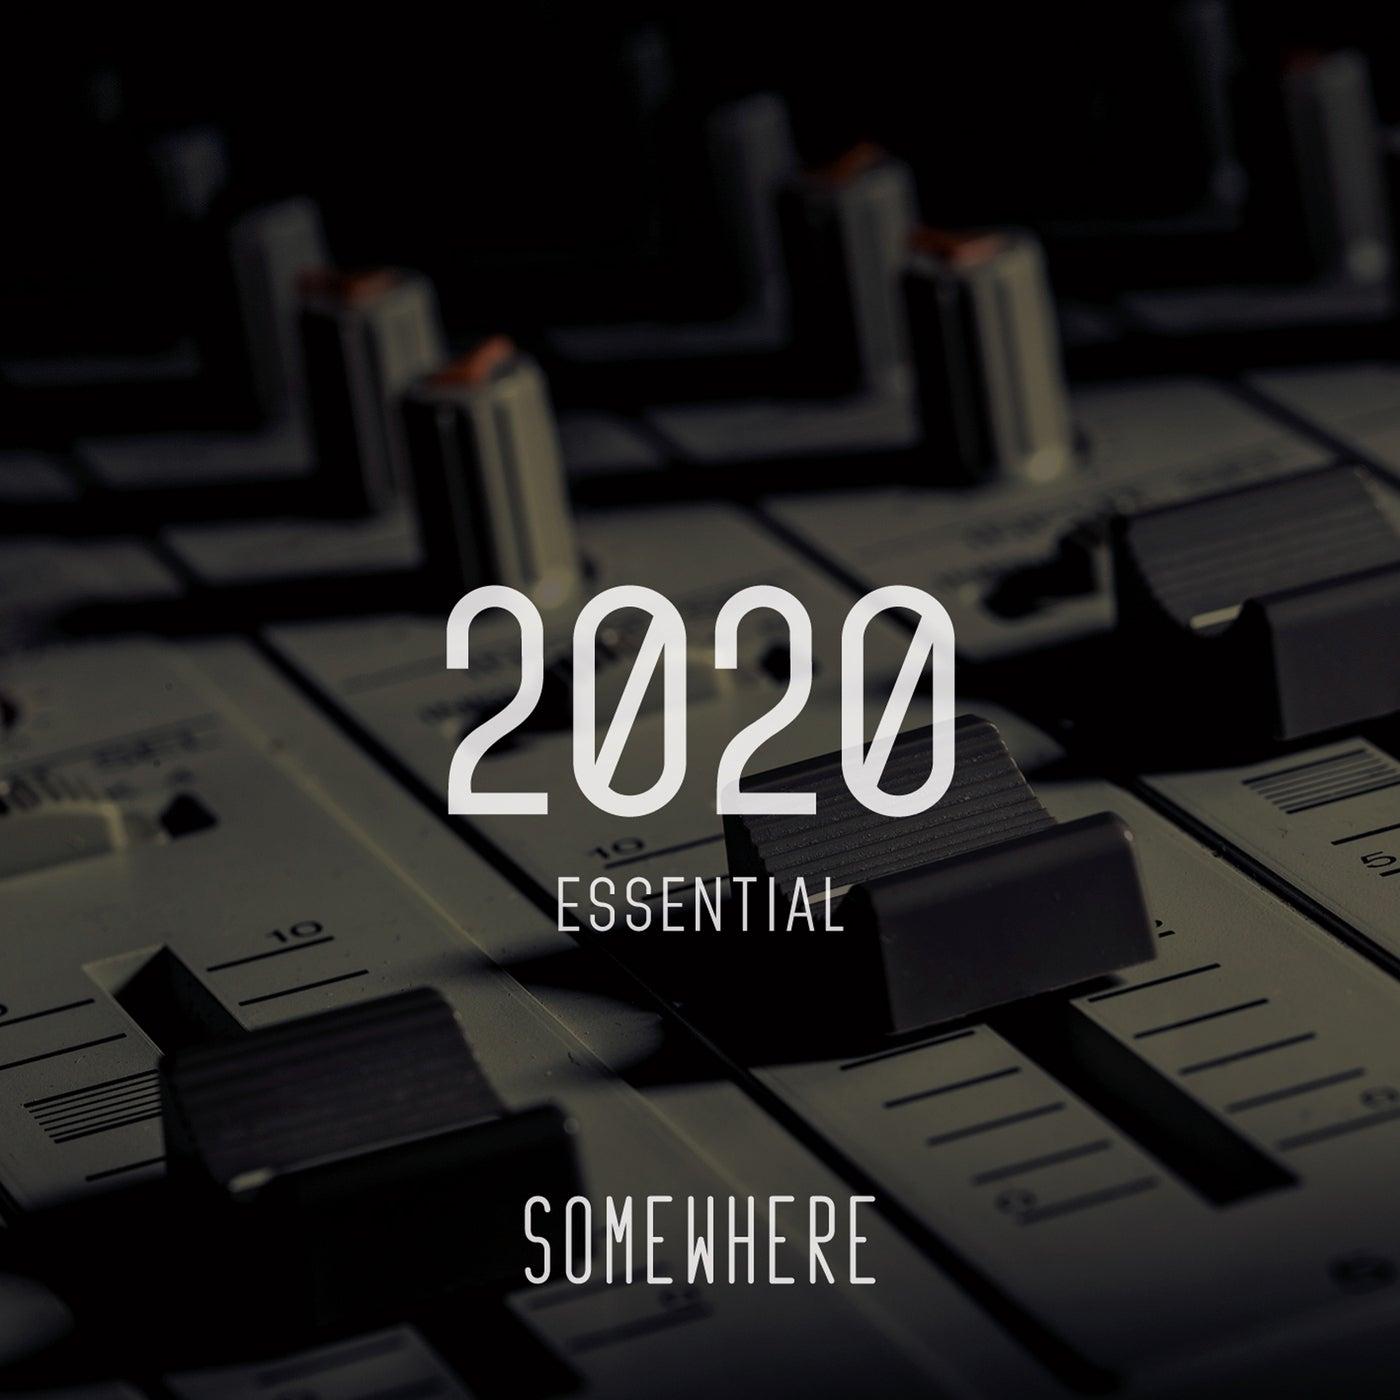 VA - 2020 Essential [Somewhere]